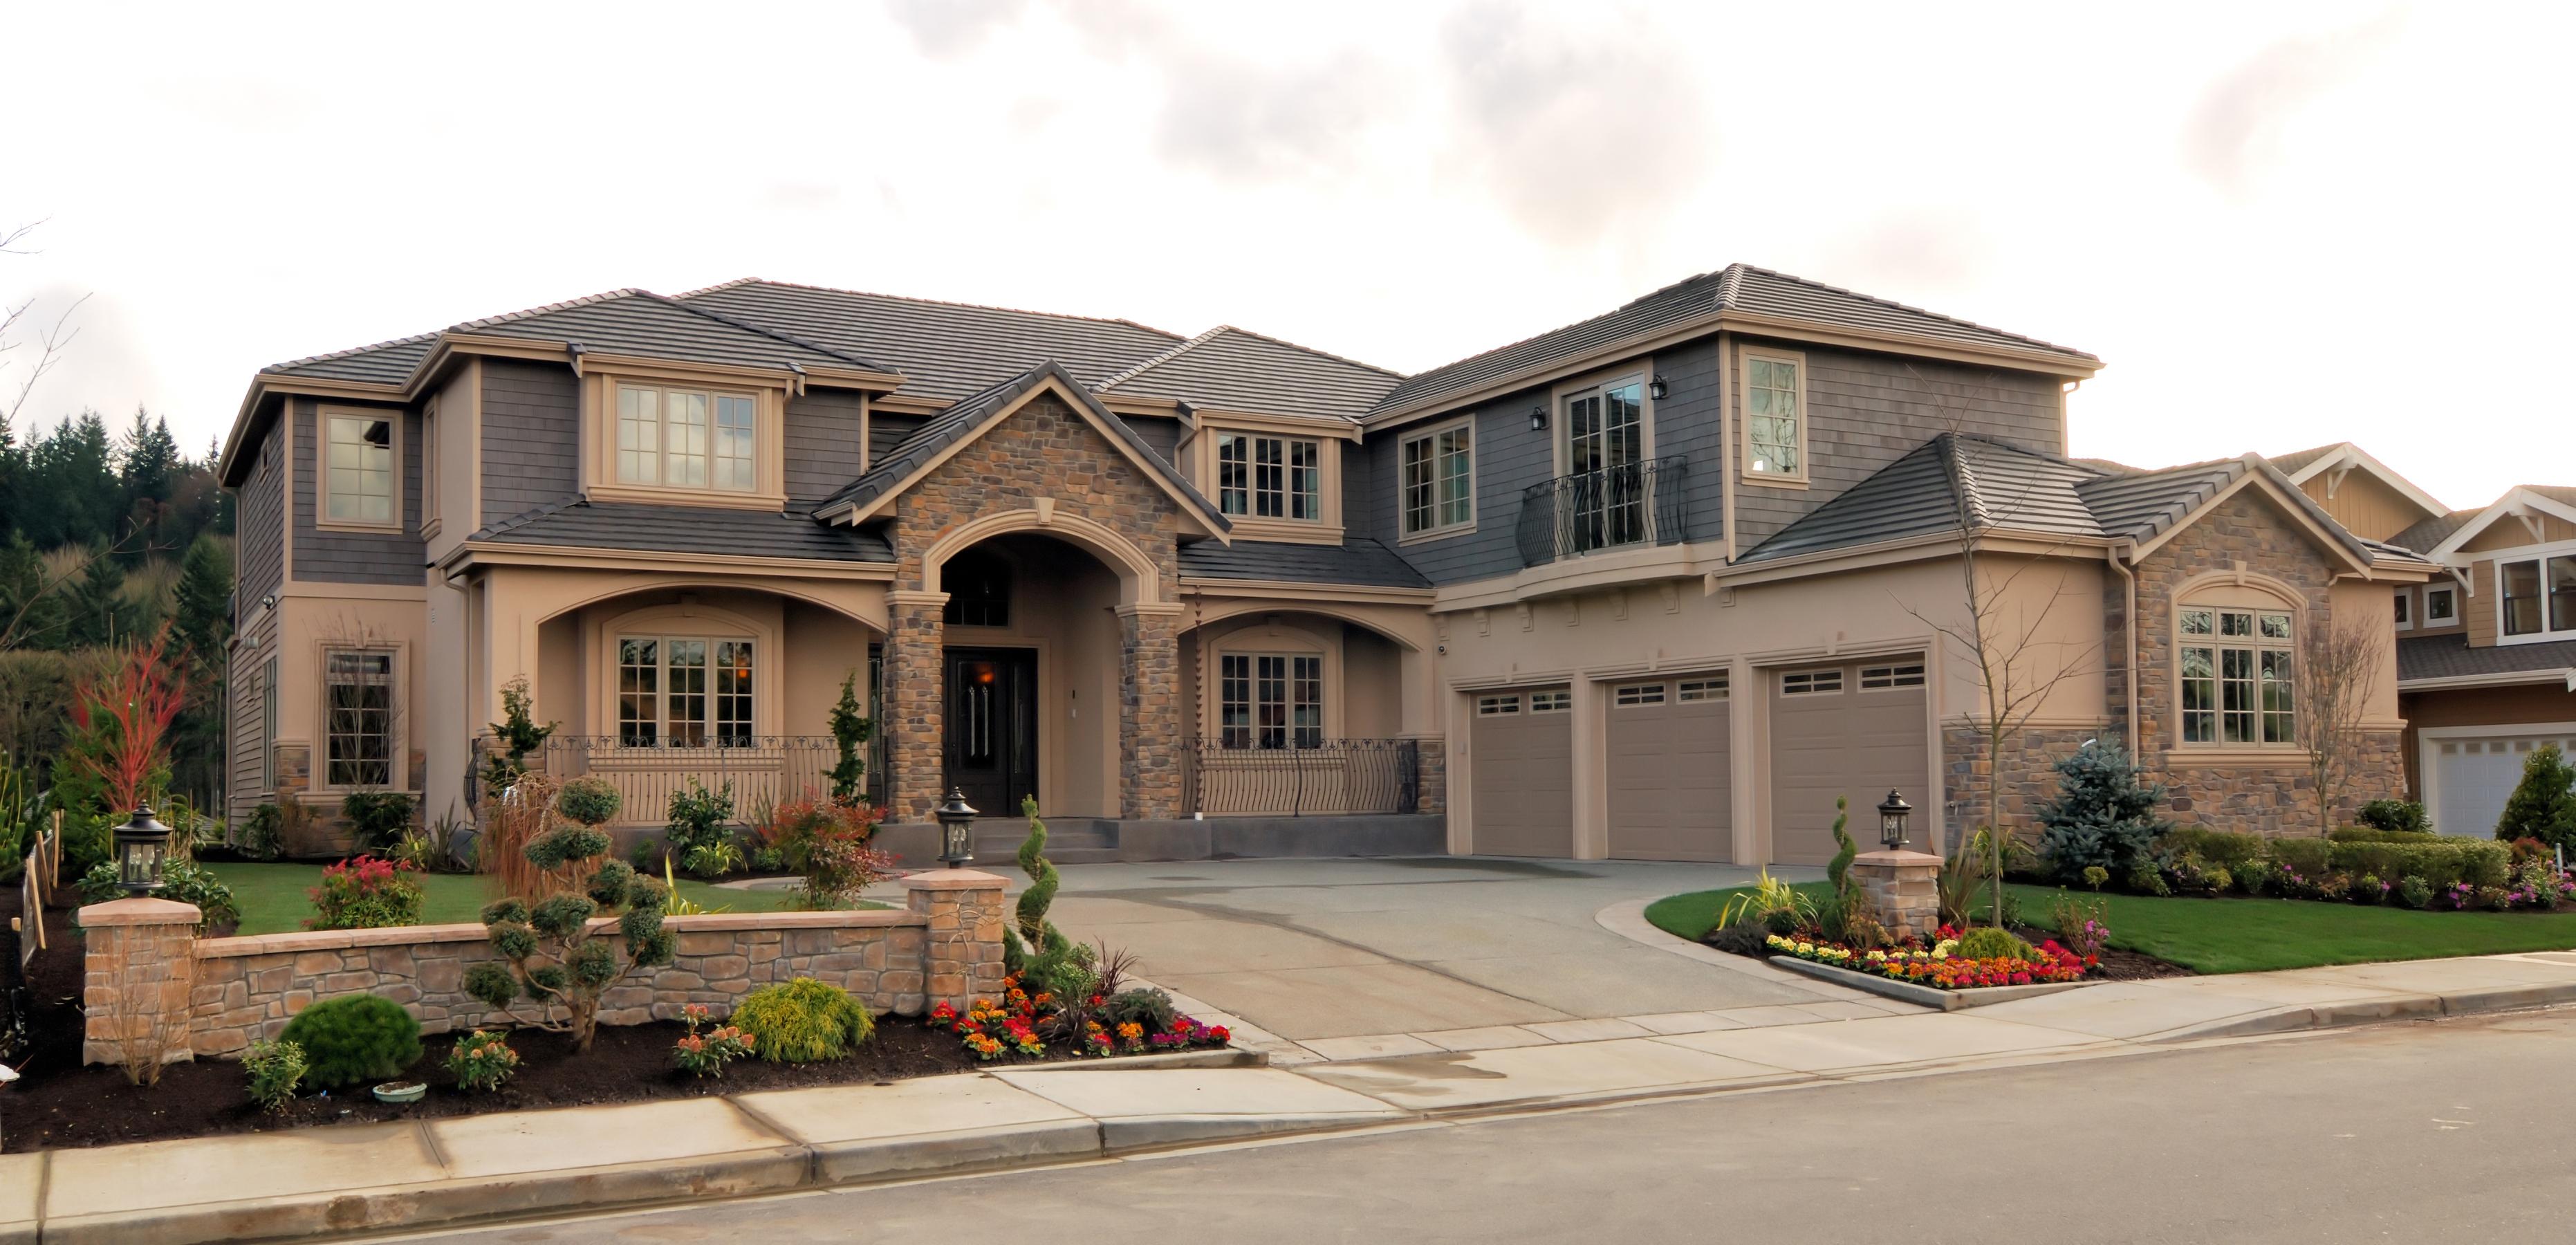 bigstock-Large-American-Home-1414403